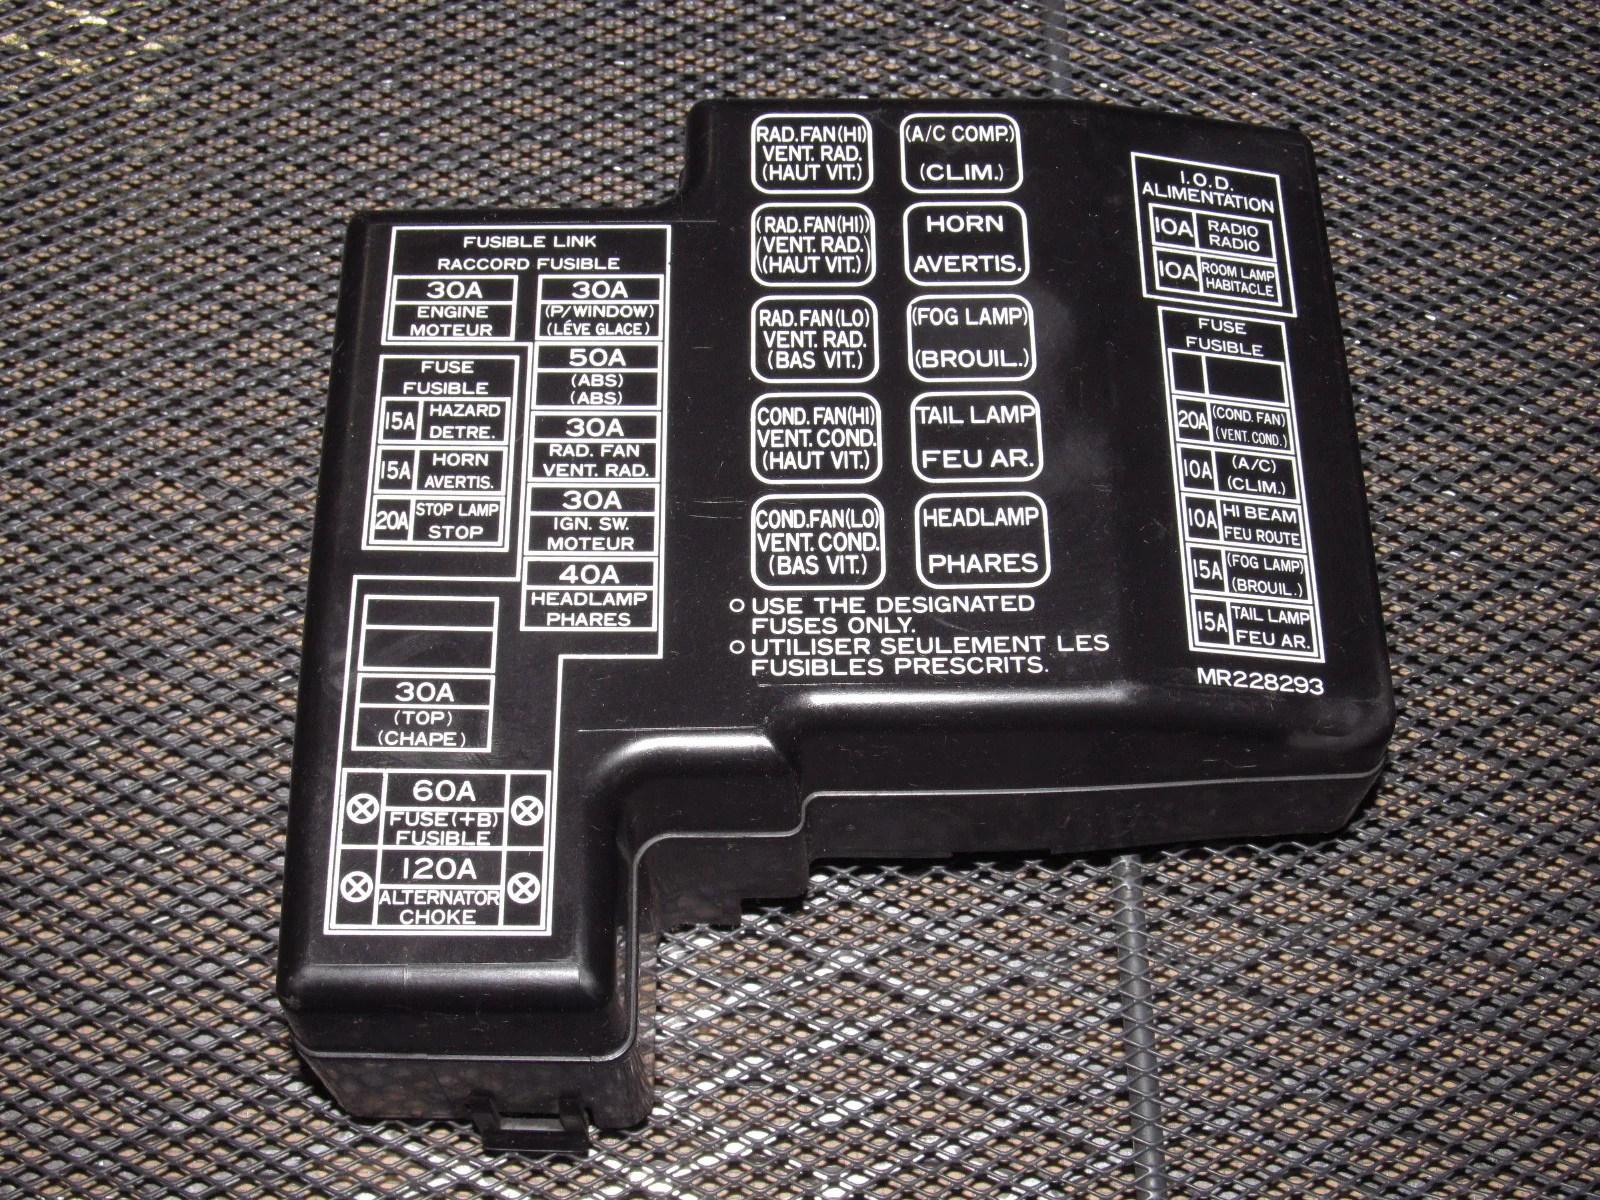 medium resolution of 97 98 99 mitsubishi eclipse oem engine fuse box cover autopartone com rh autopartone com 1998